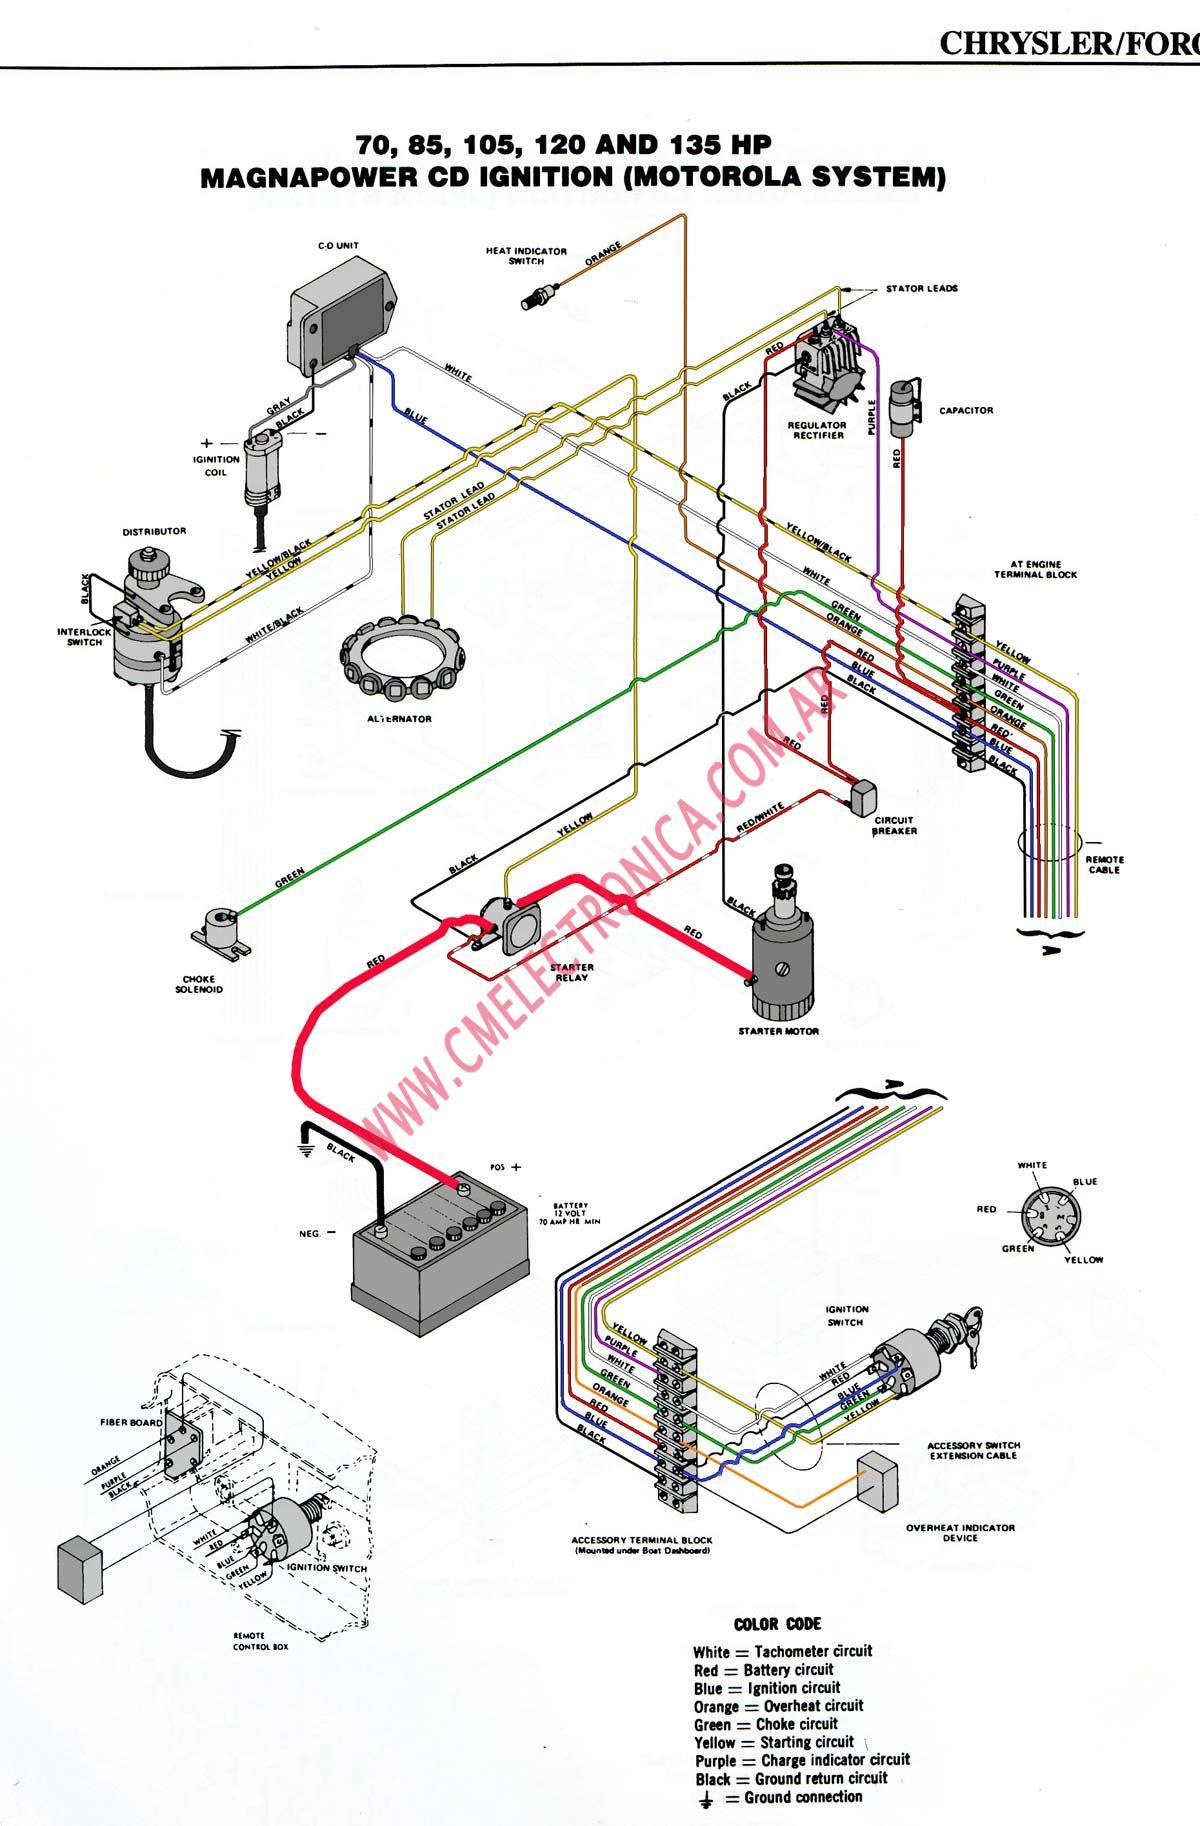 Diagrama Chrysler Force 4cyl Motorola